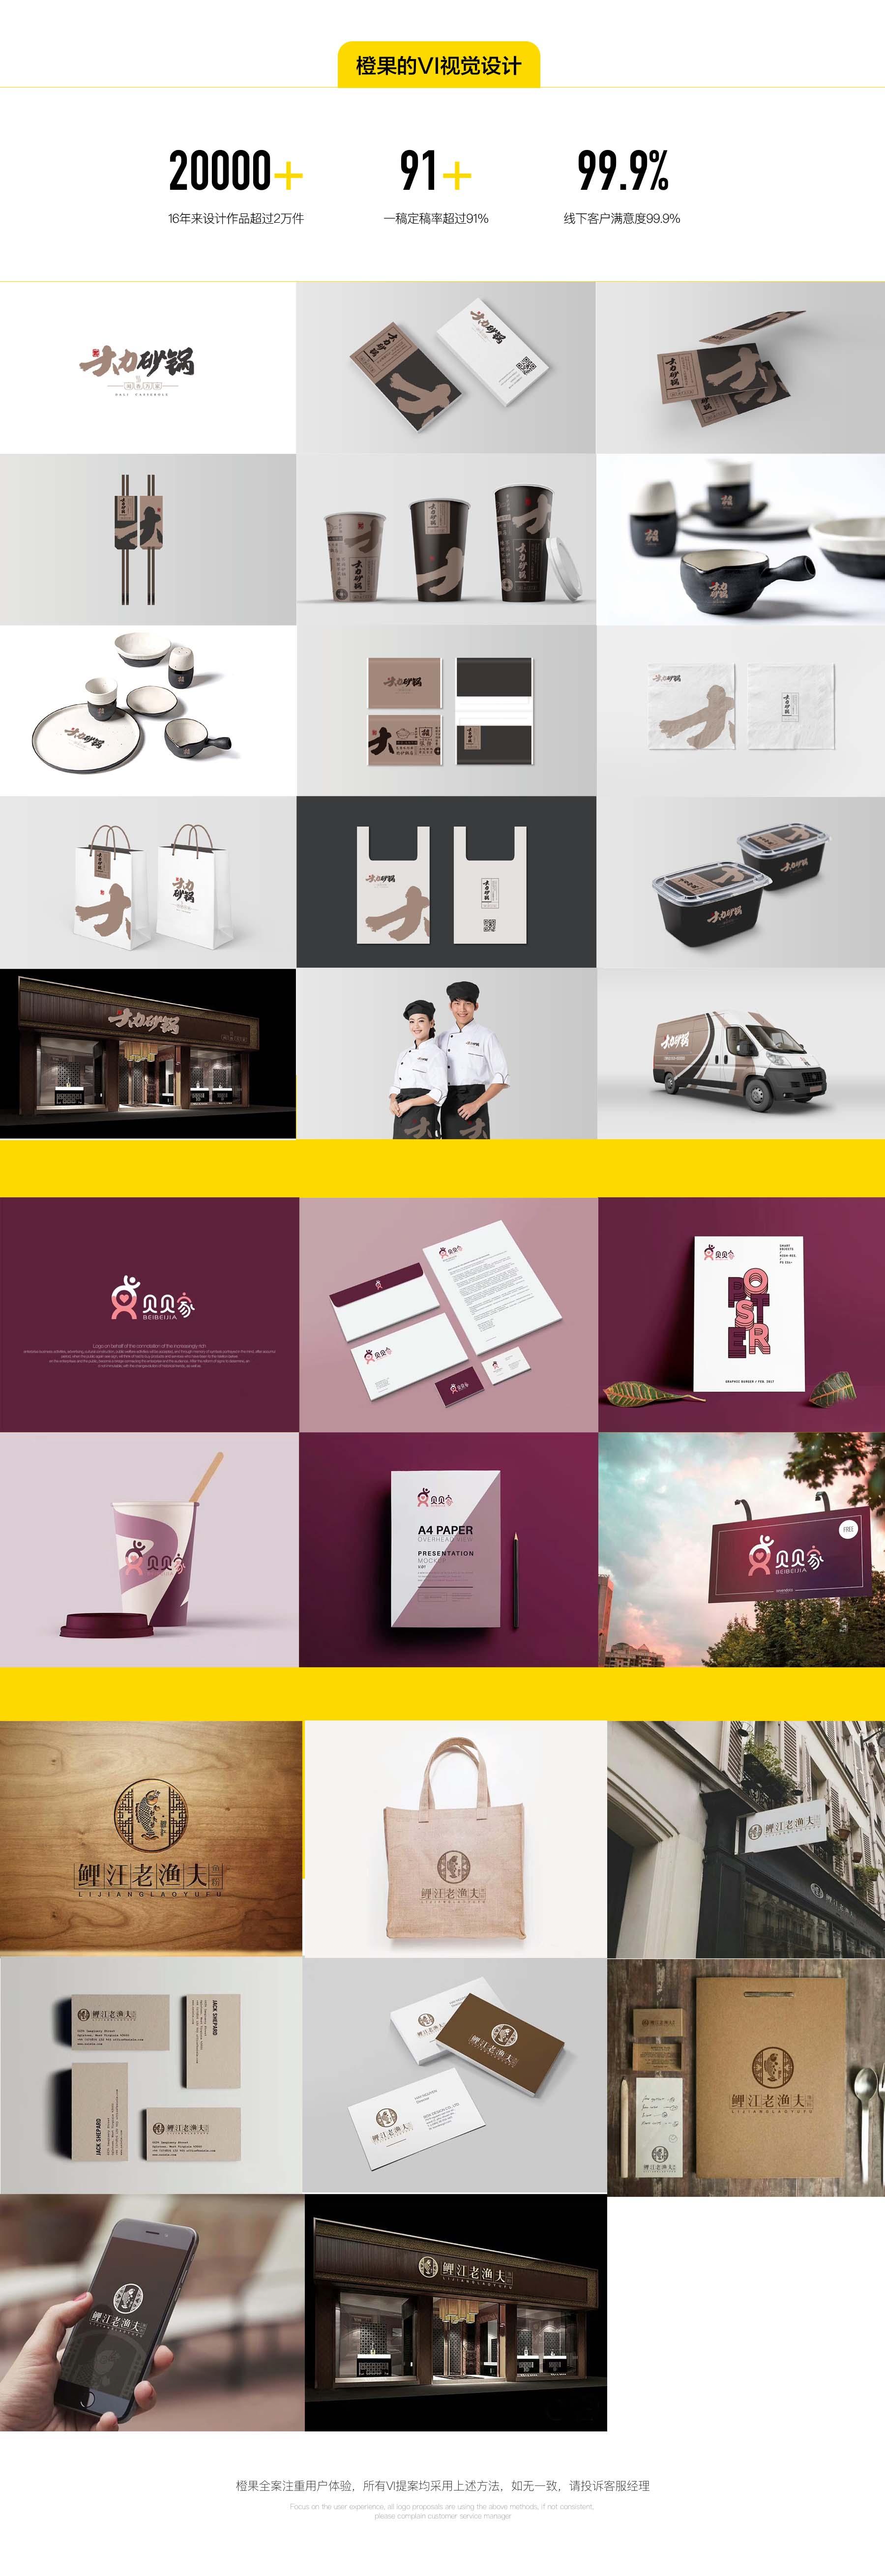 VI系统设计_橙果全案VIS企业导视系统娱乐酒店餐饮旅游医疗品牌VI设计6